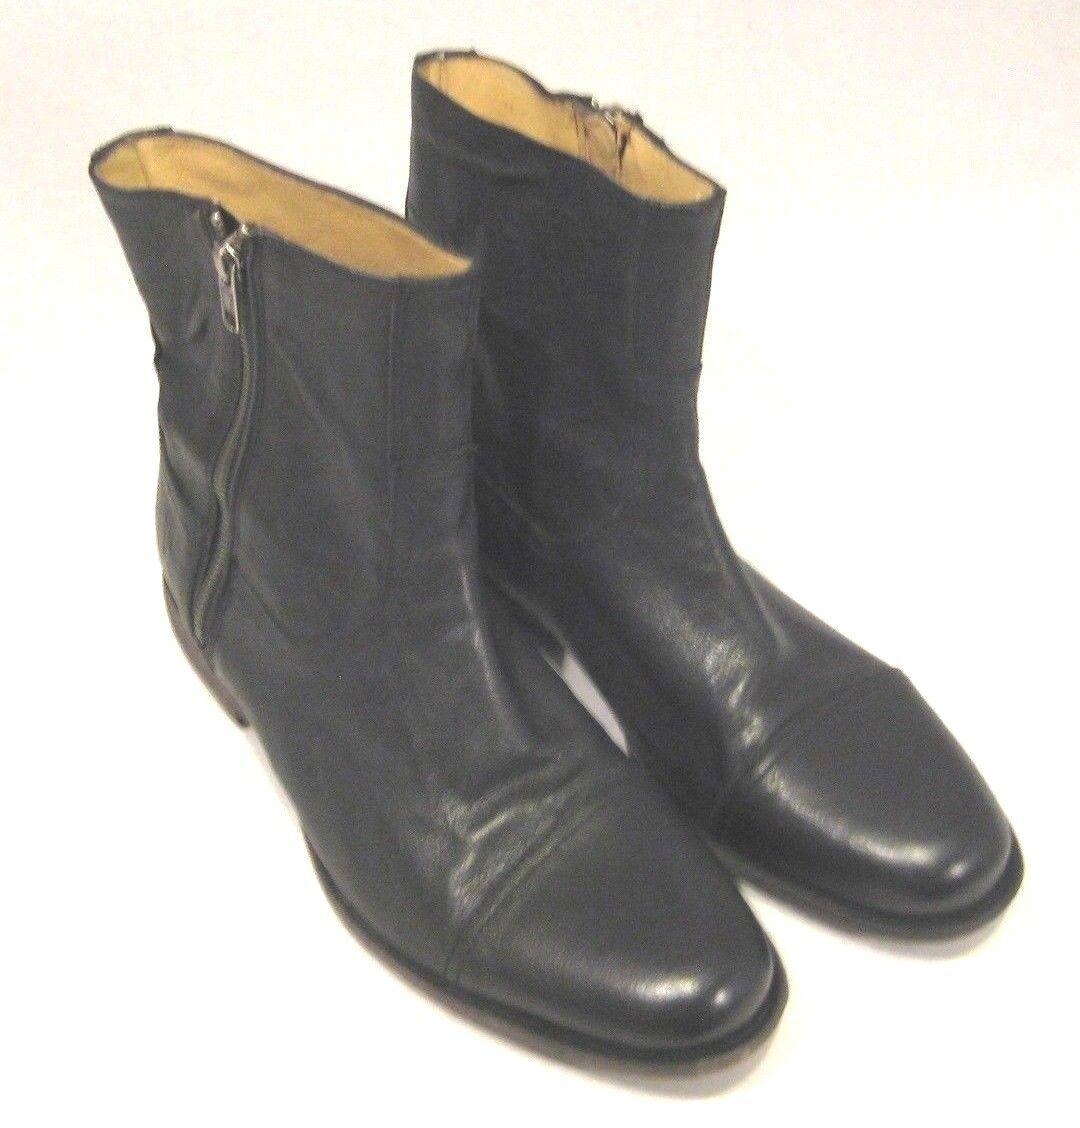 Frye SideZip Black Leather Ankle Boots 8.5 D M Casual Dress Cap Toe Outside